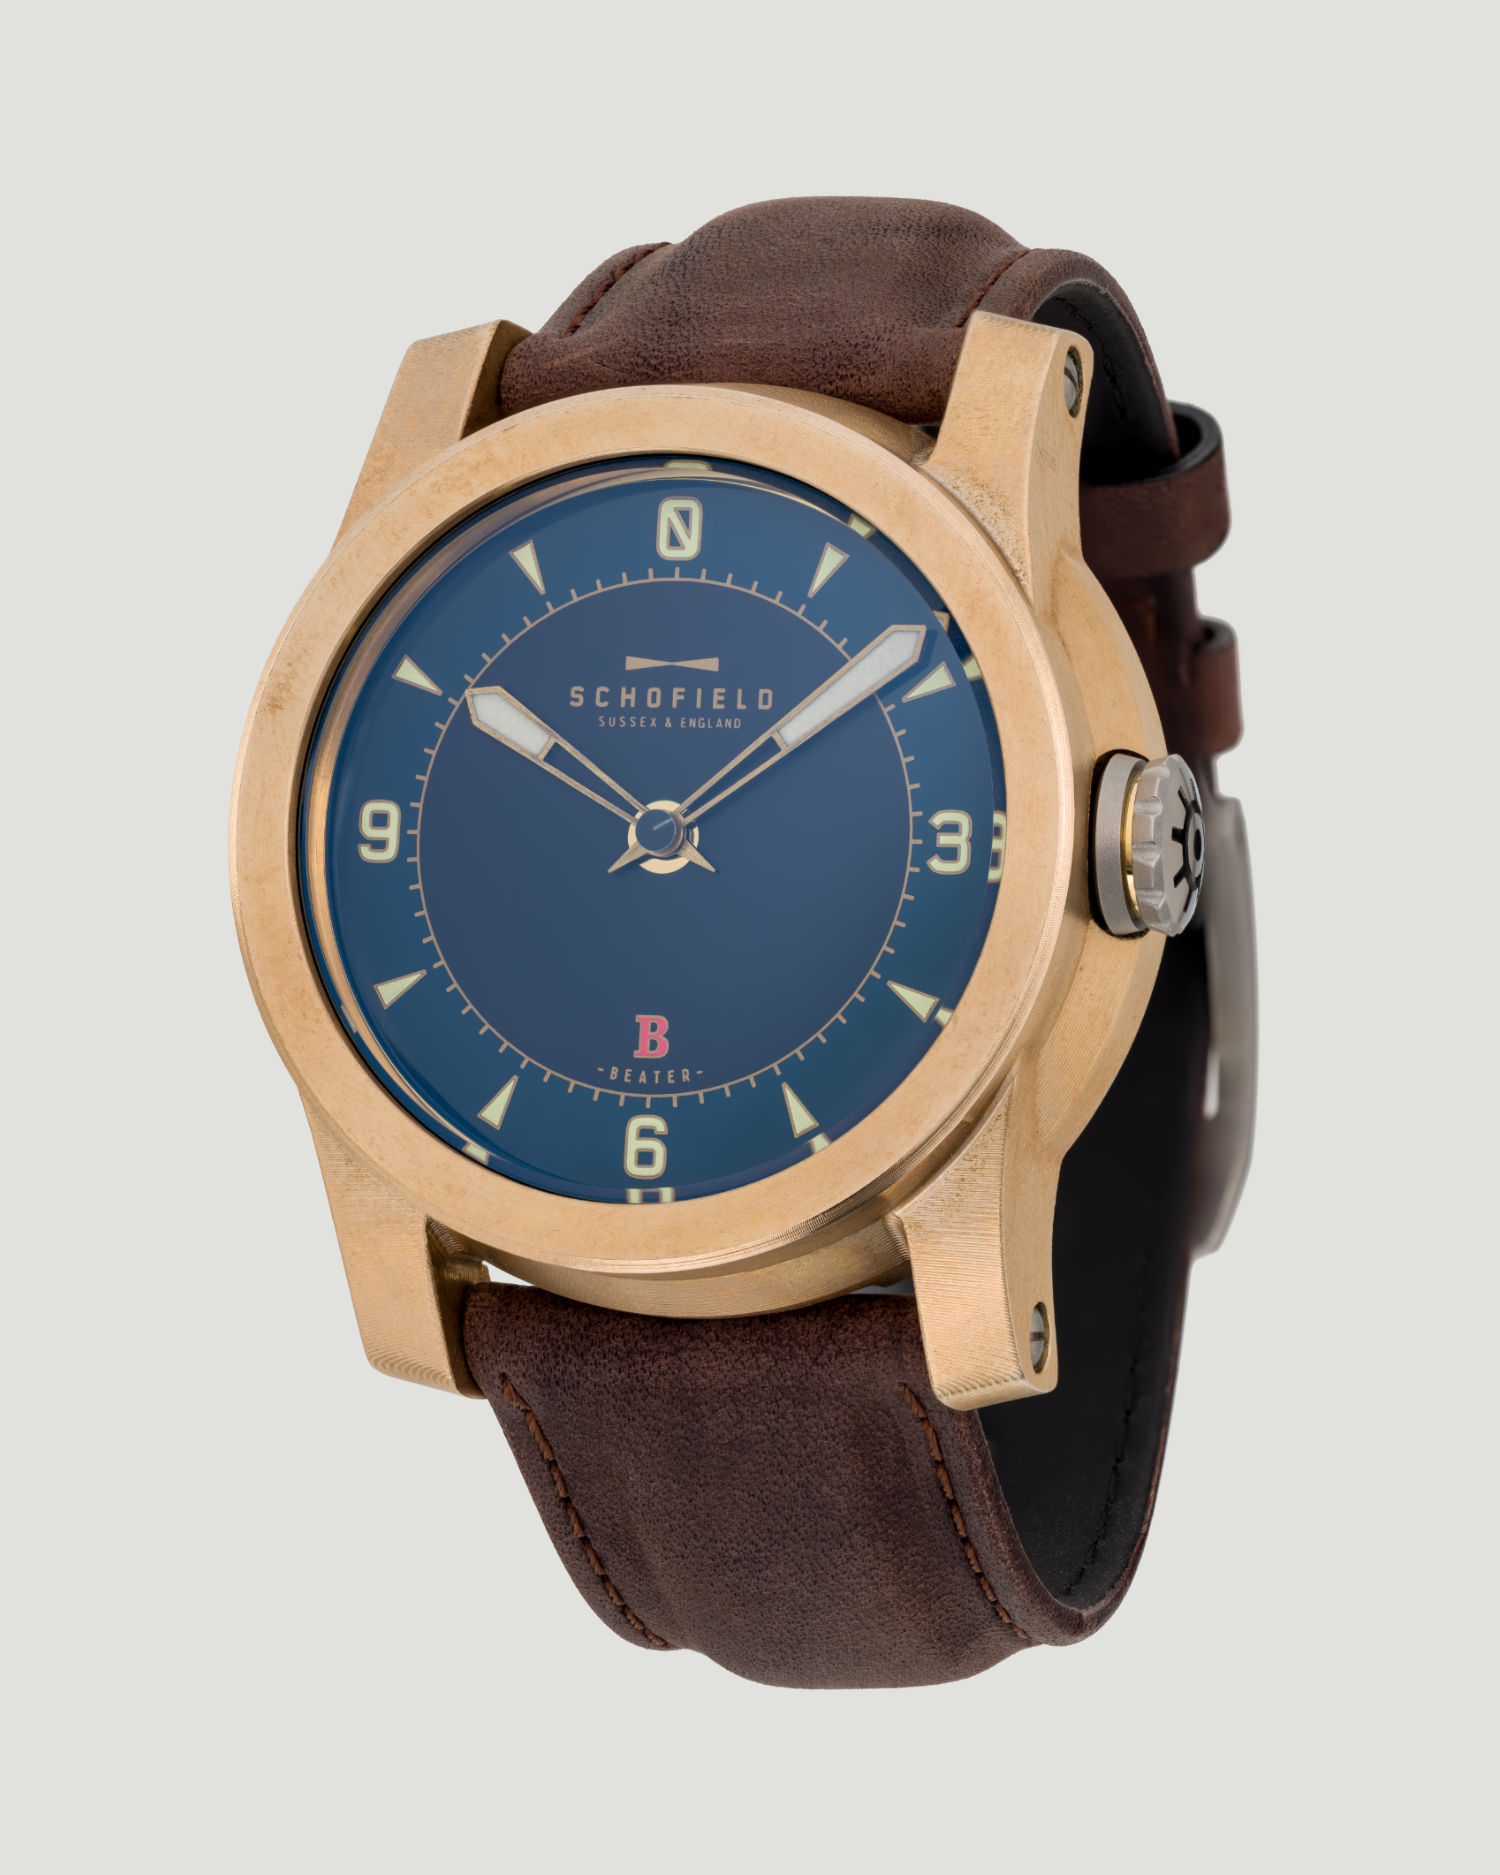 Raw Bronze watch Schofield Beater B3